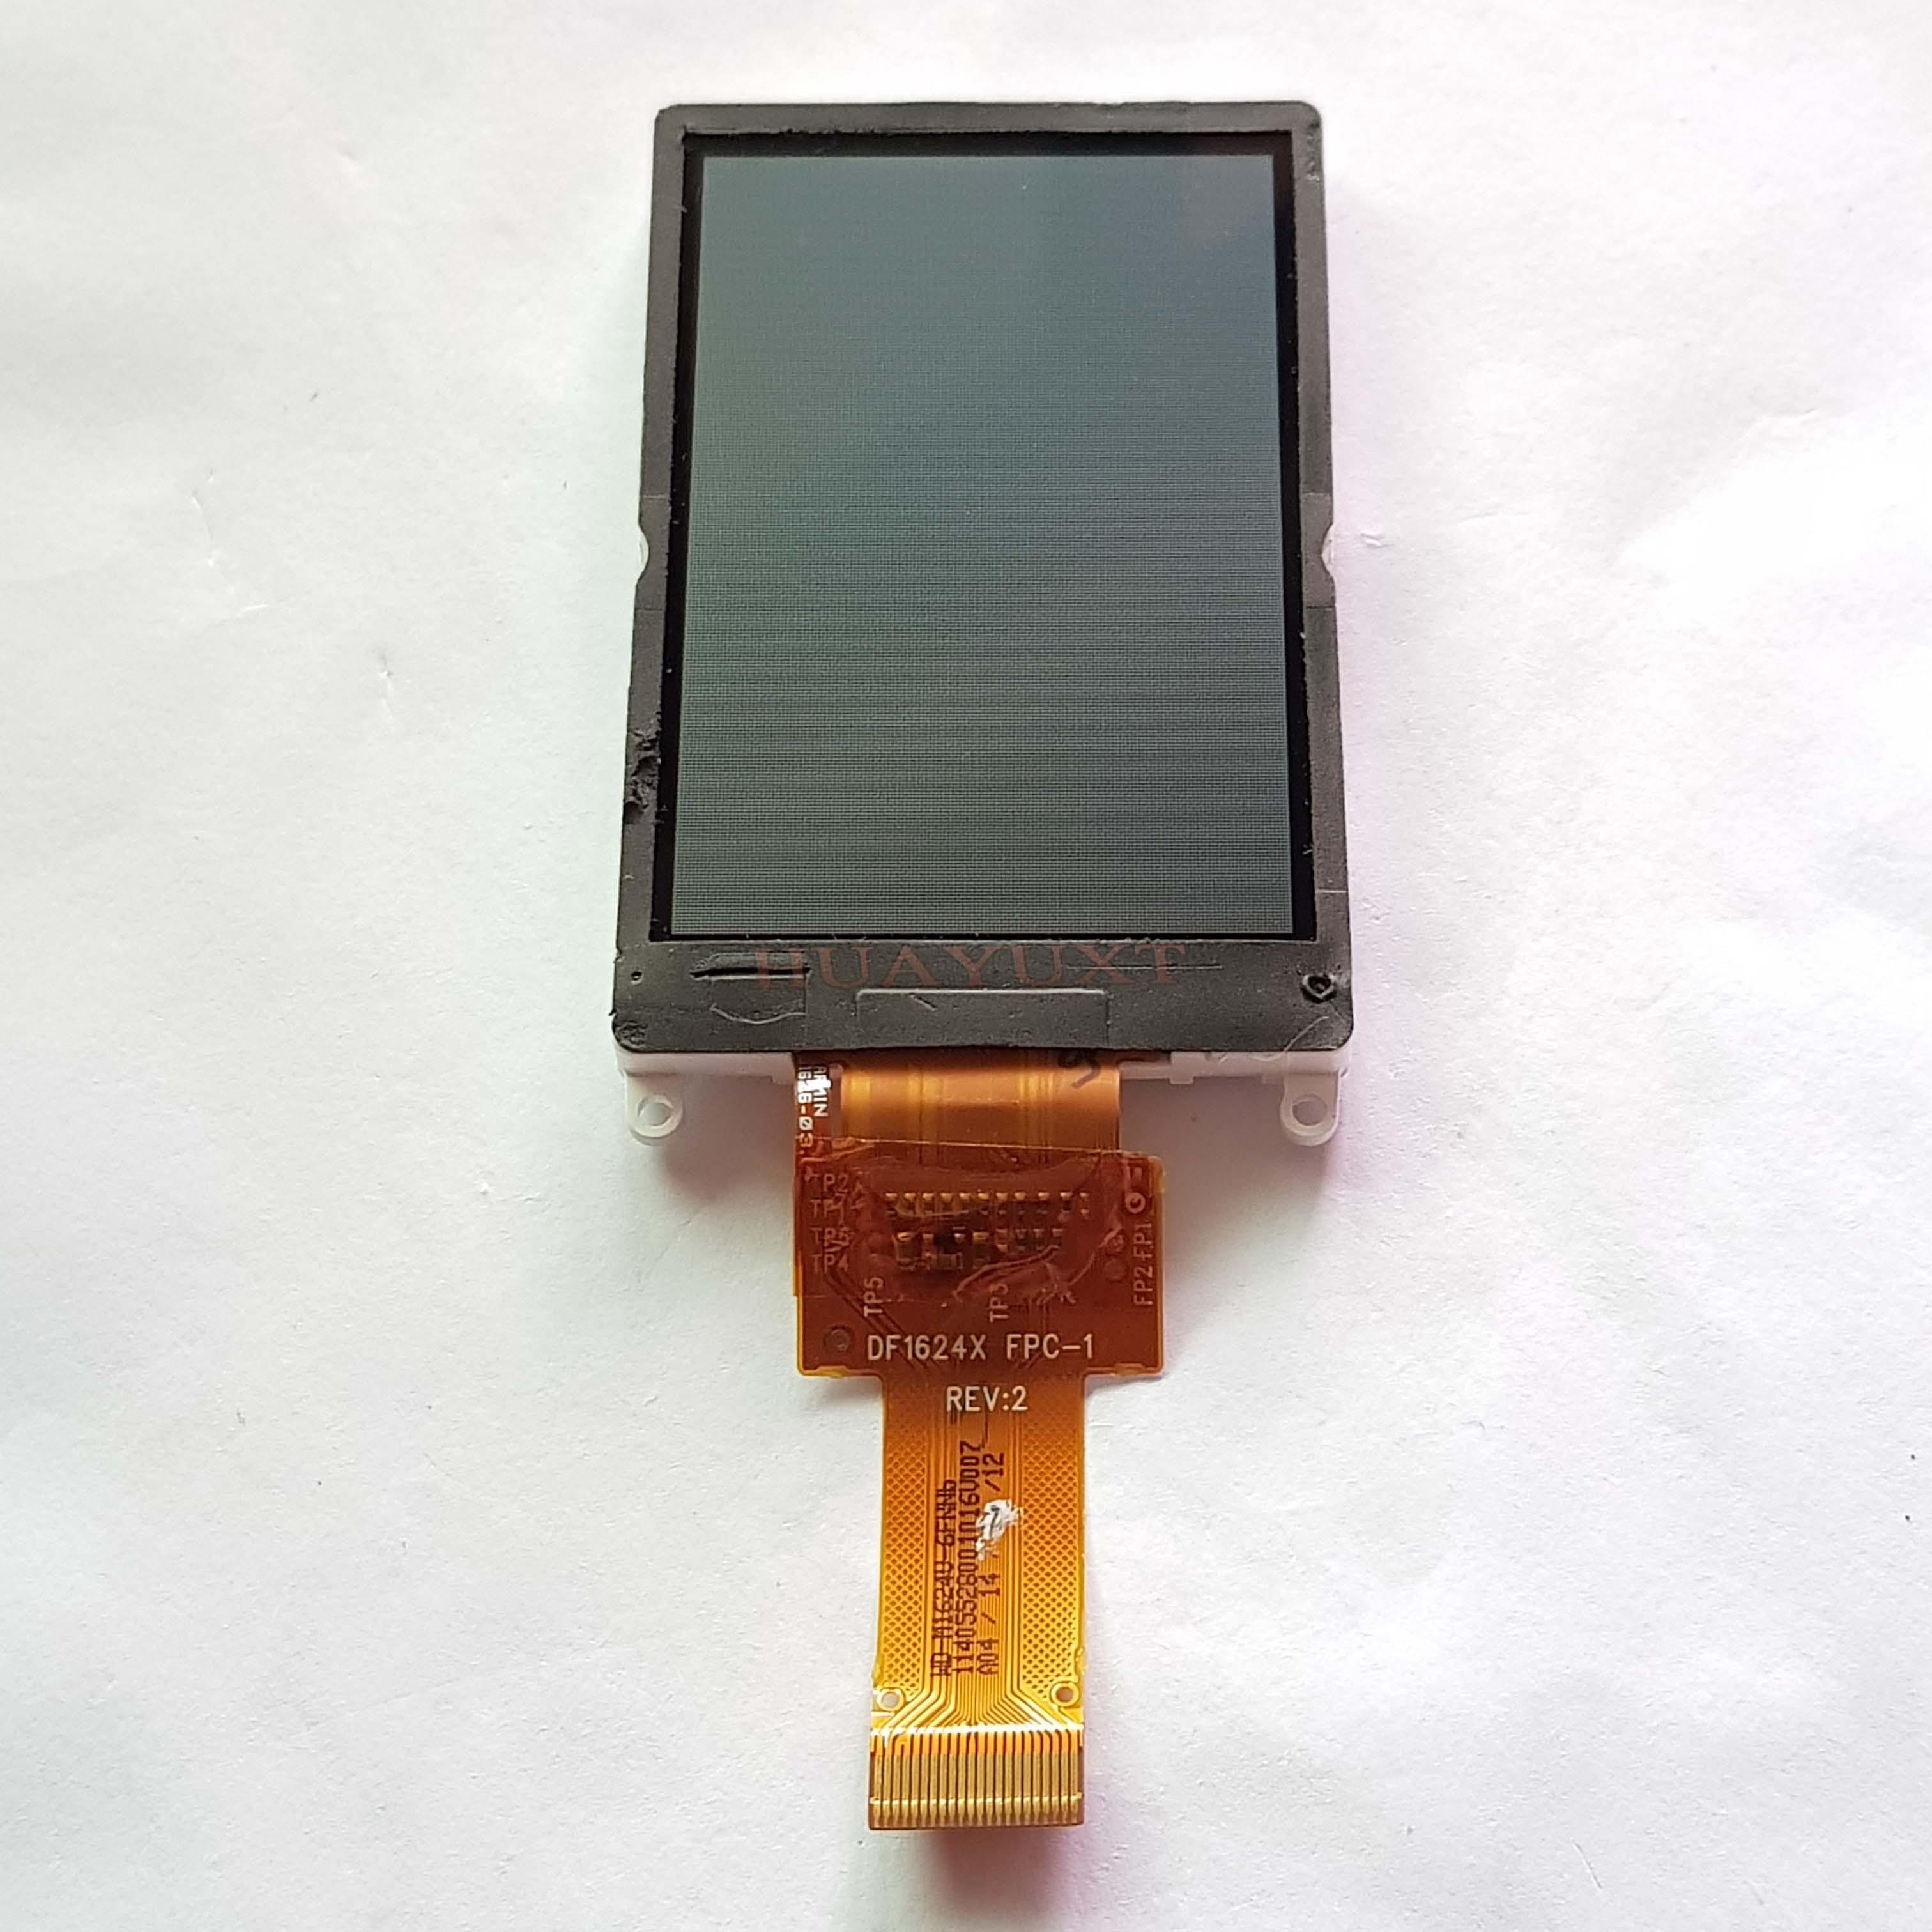 Original Bicycle stopwatch LCD screen for Garmin edge 810 bicycle speed meter GPS LCD display screen panel Repair replacement enlarge